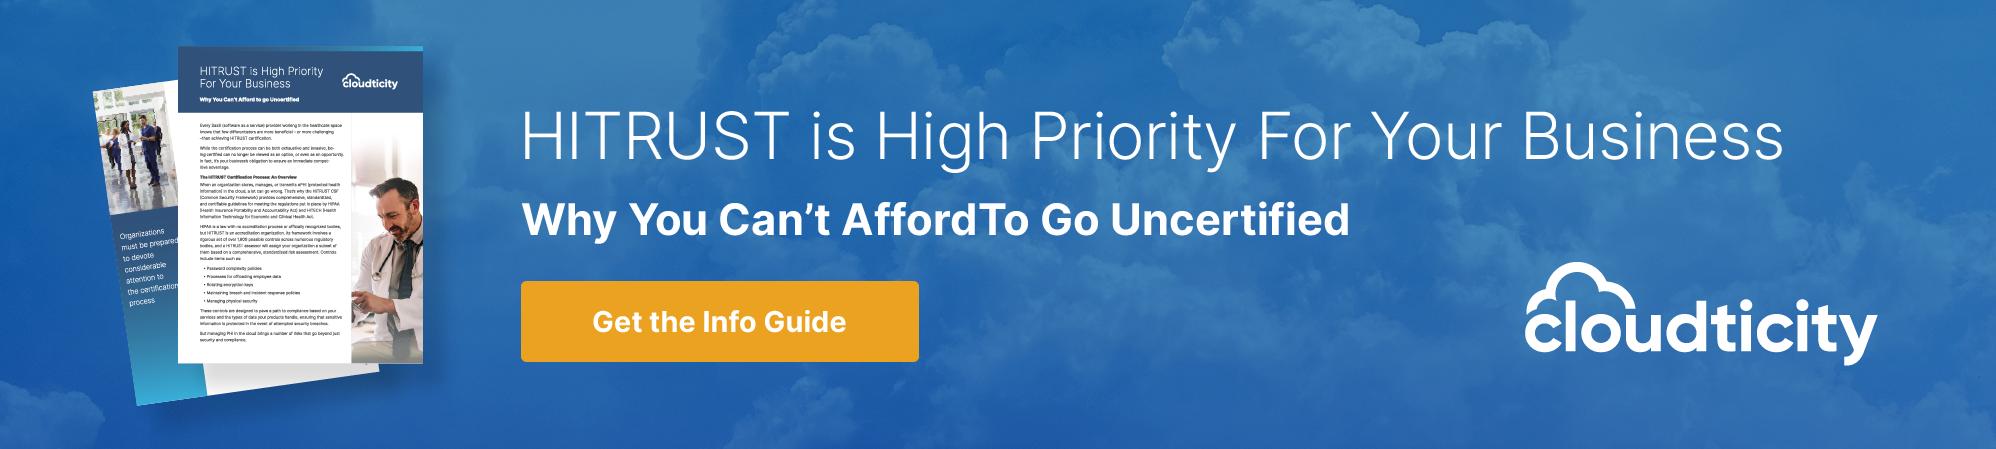 hitrust-is-high-priority